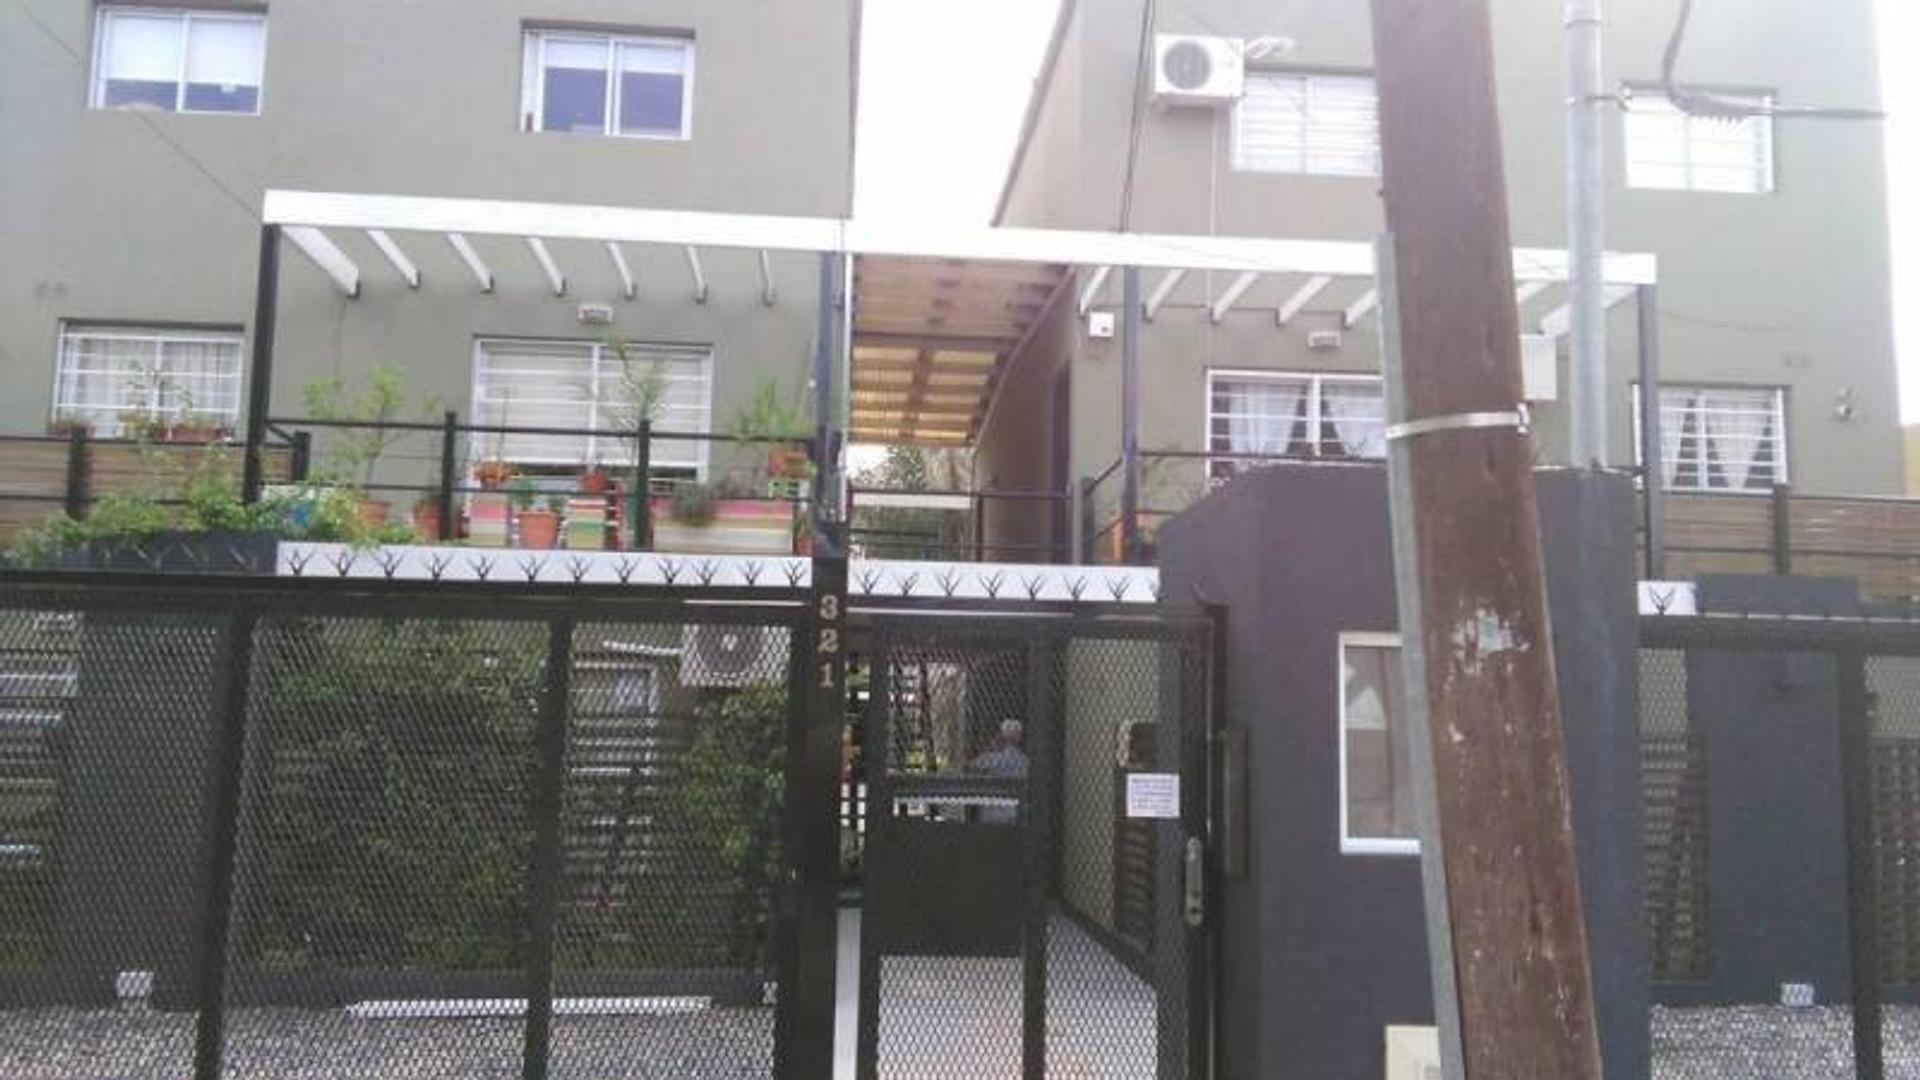 Venta de Departamento en Condominio Edra zona Pilar, Gran Bs.As., Argentina,